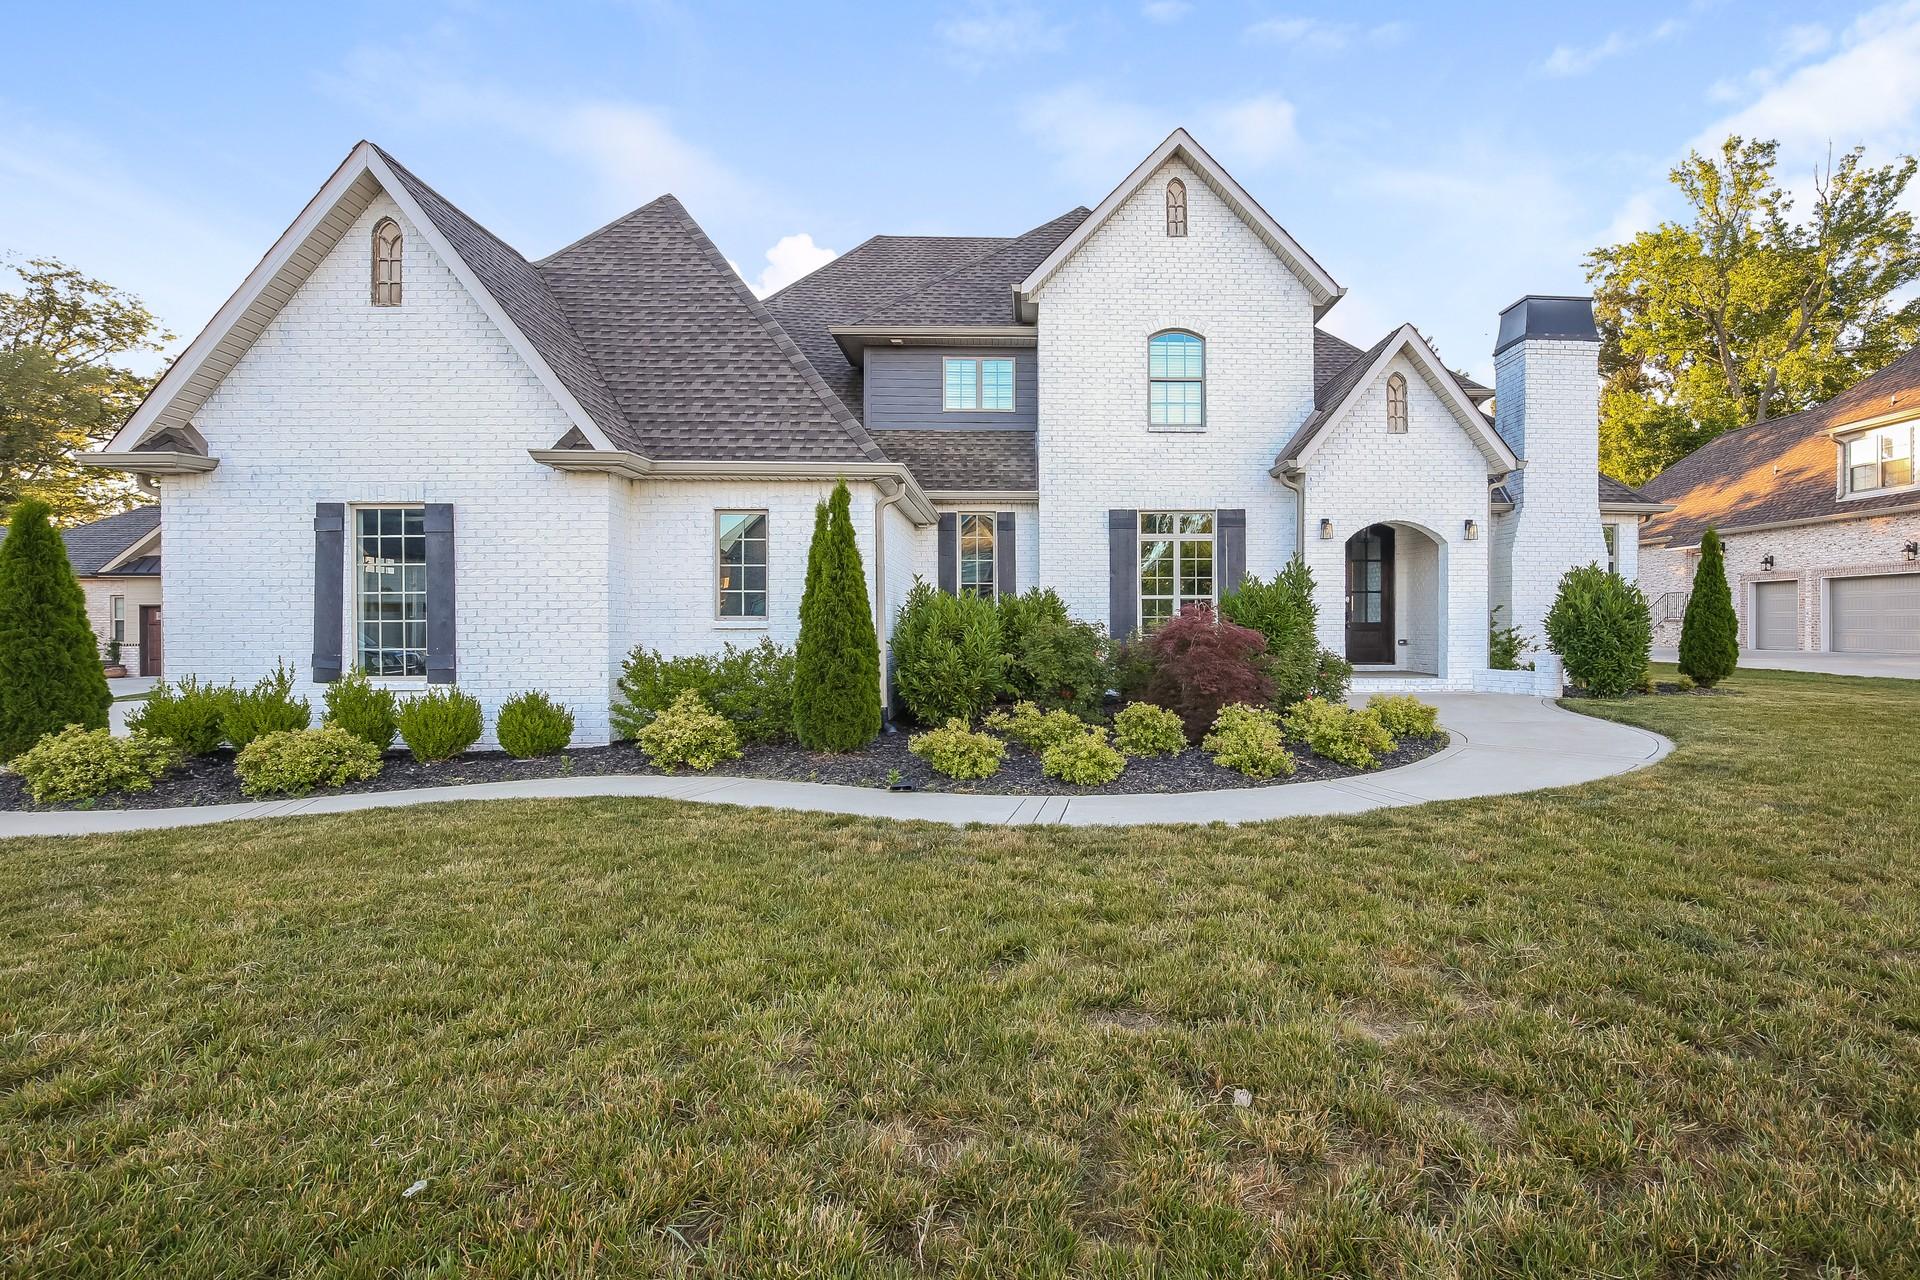 259 Harrowgate Dr Property Photo 1